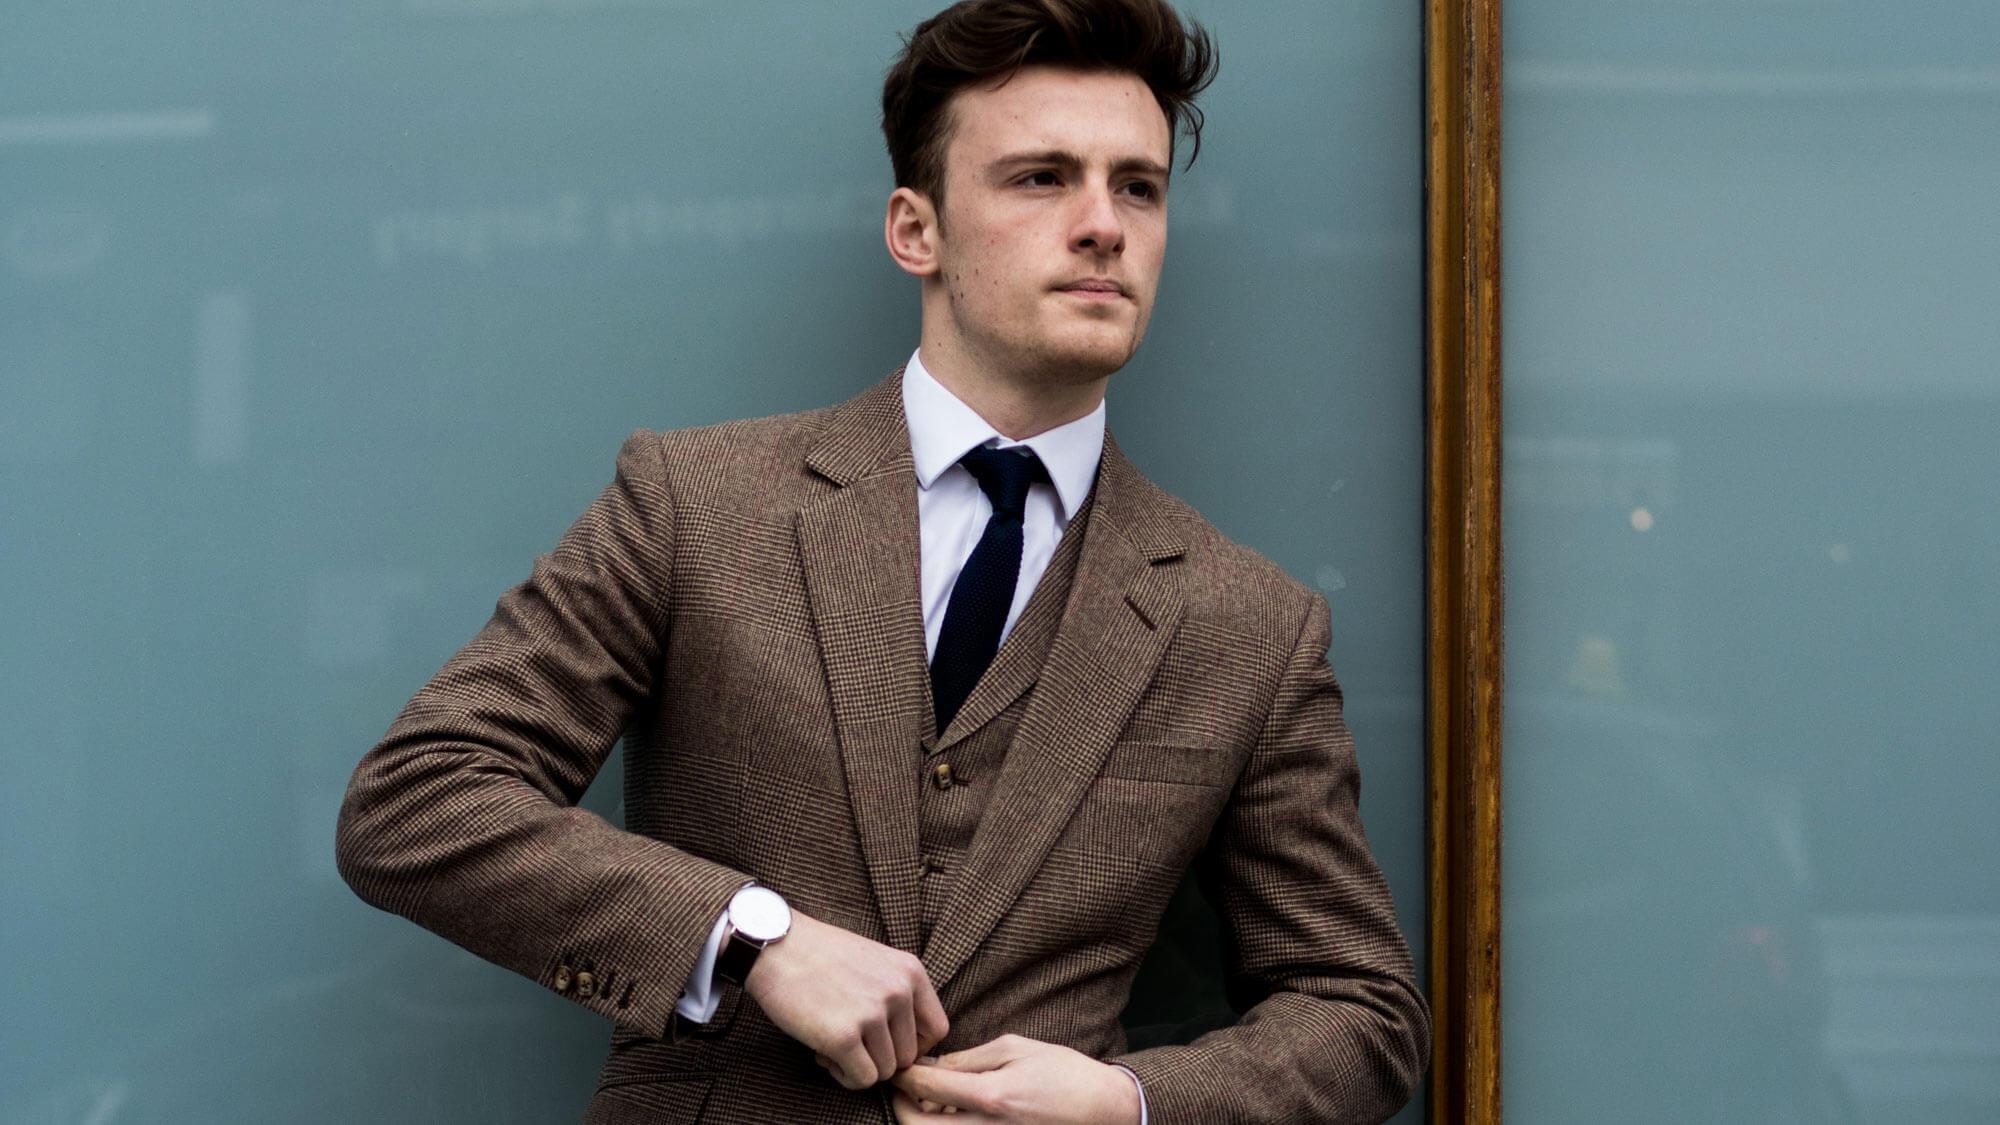 Custom Business Suit